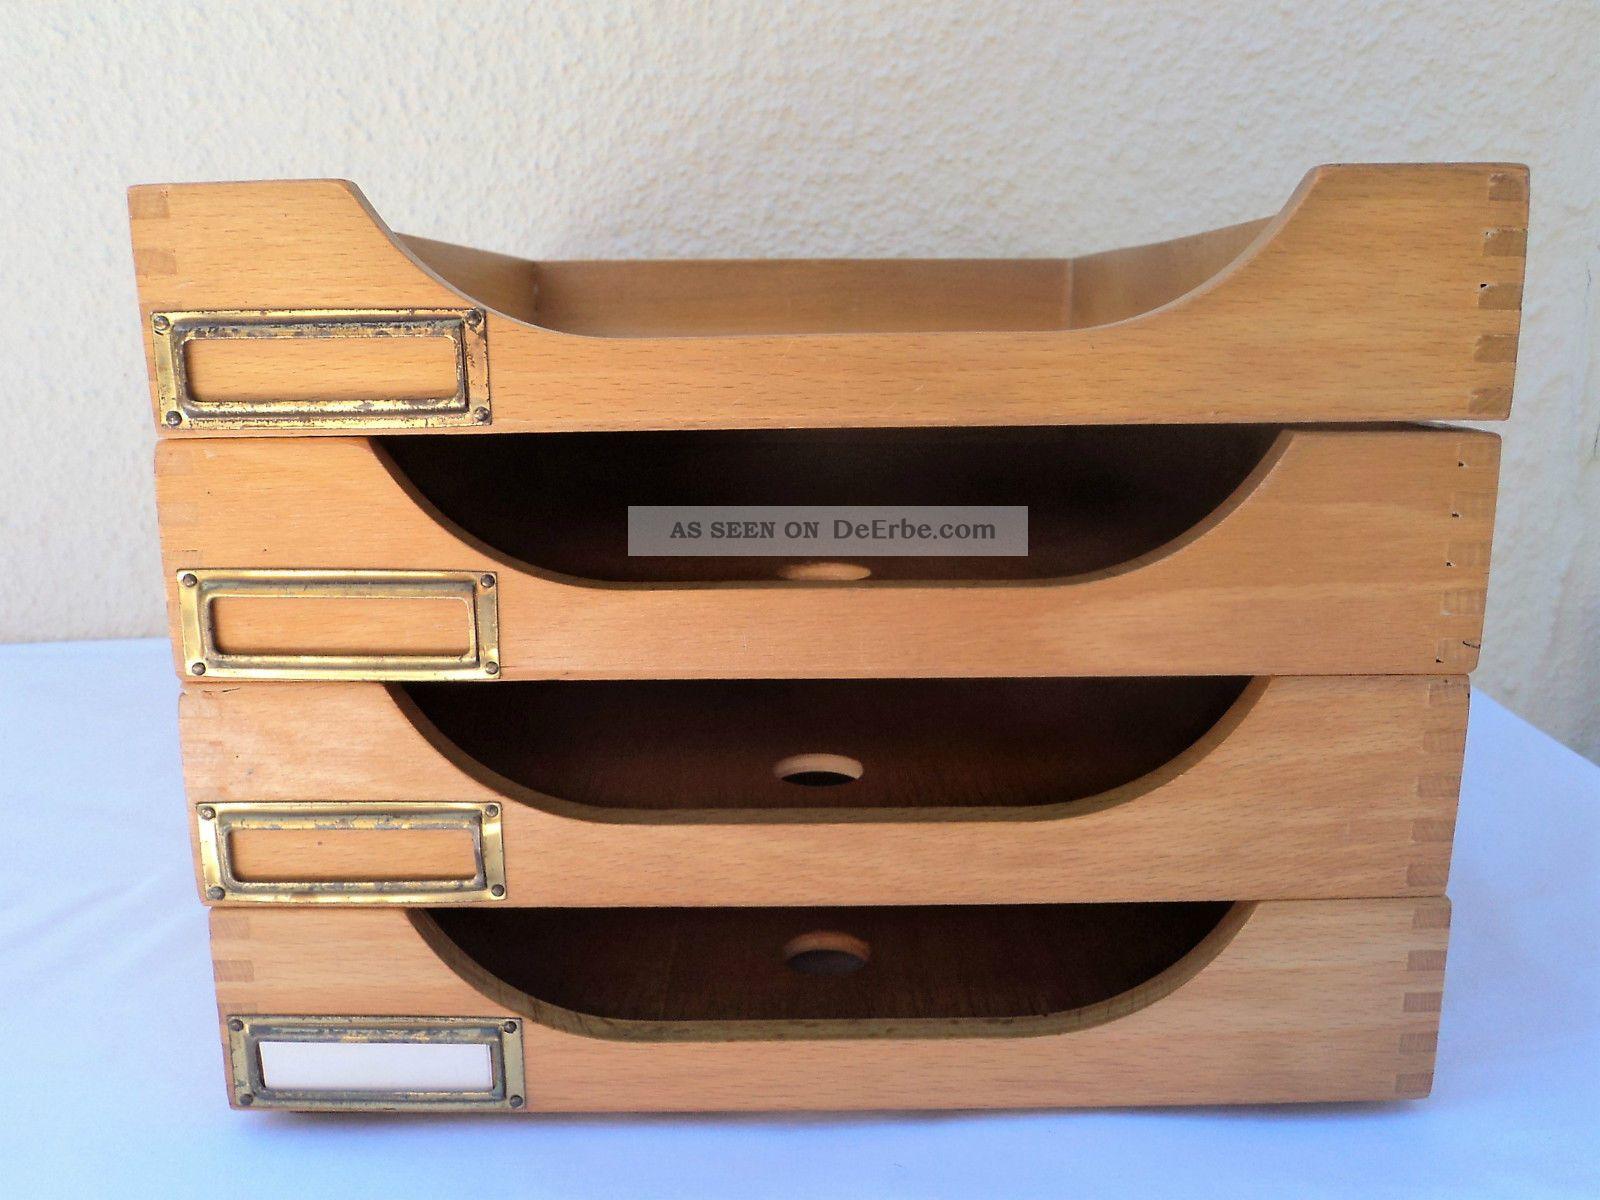 Bauhaus Buroablage Holz 4stockig Din A 4